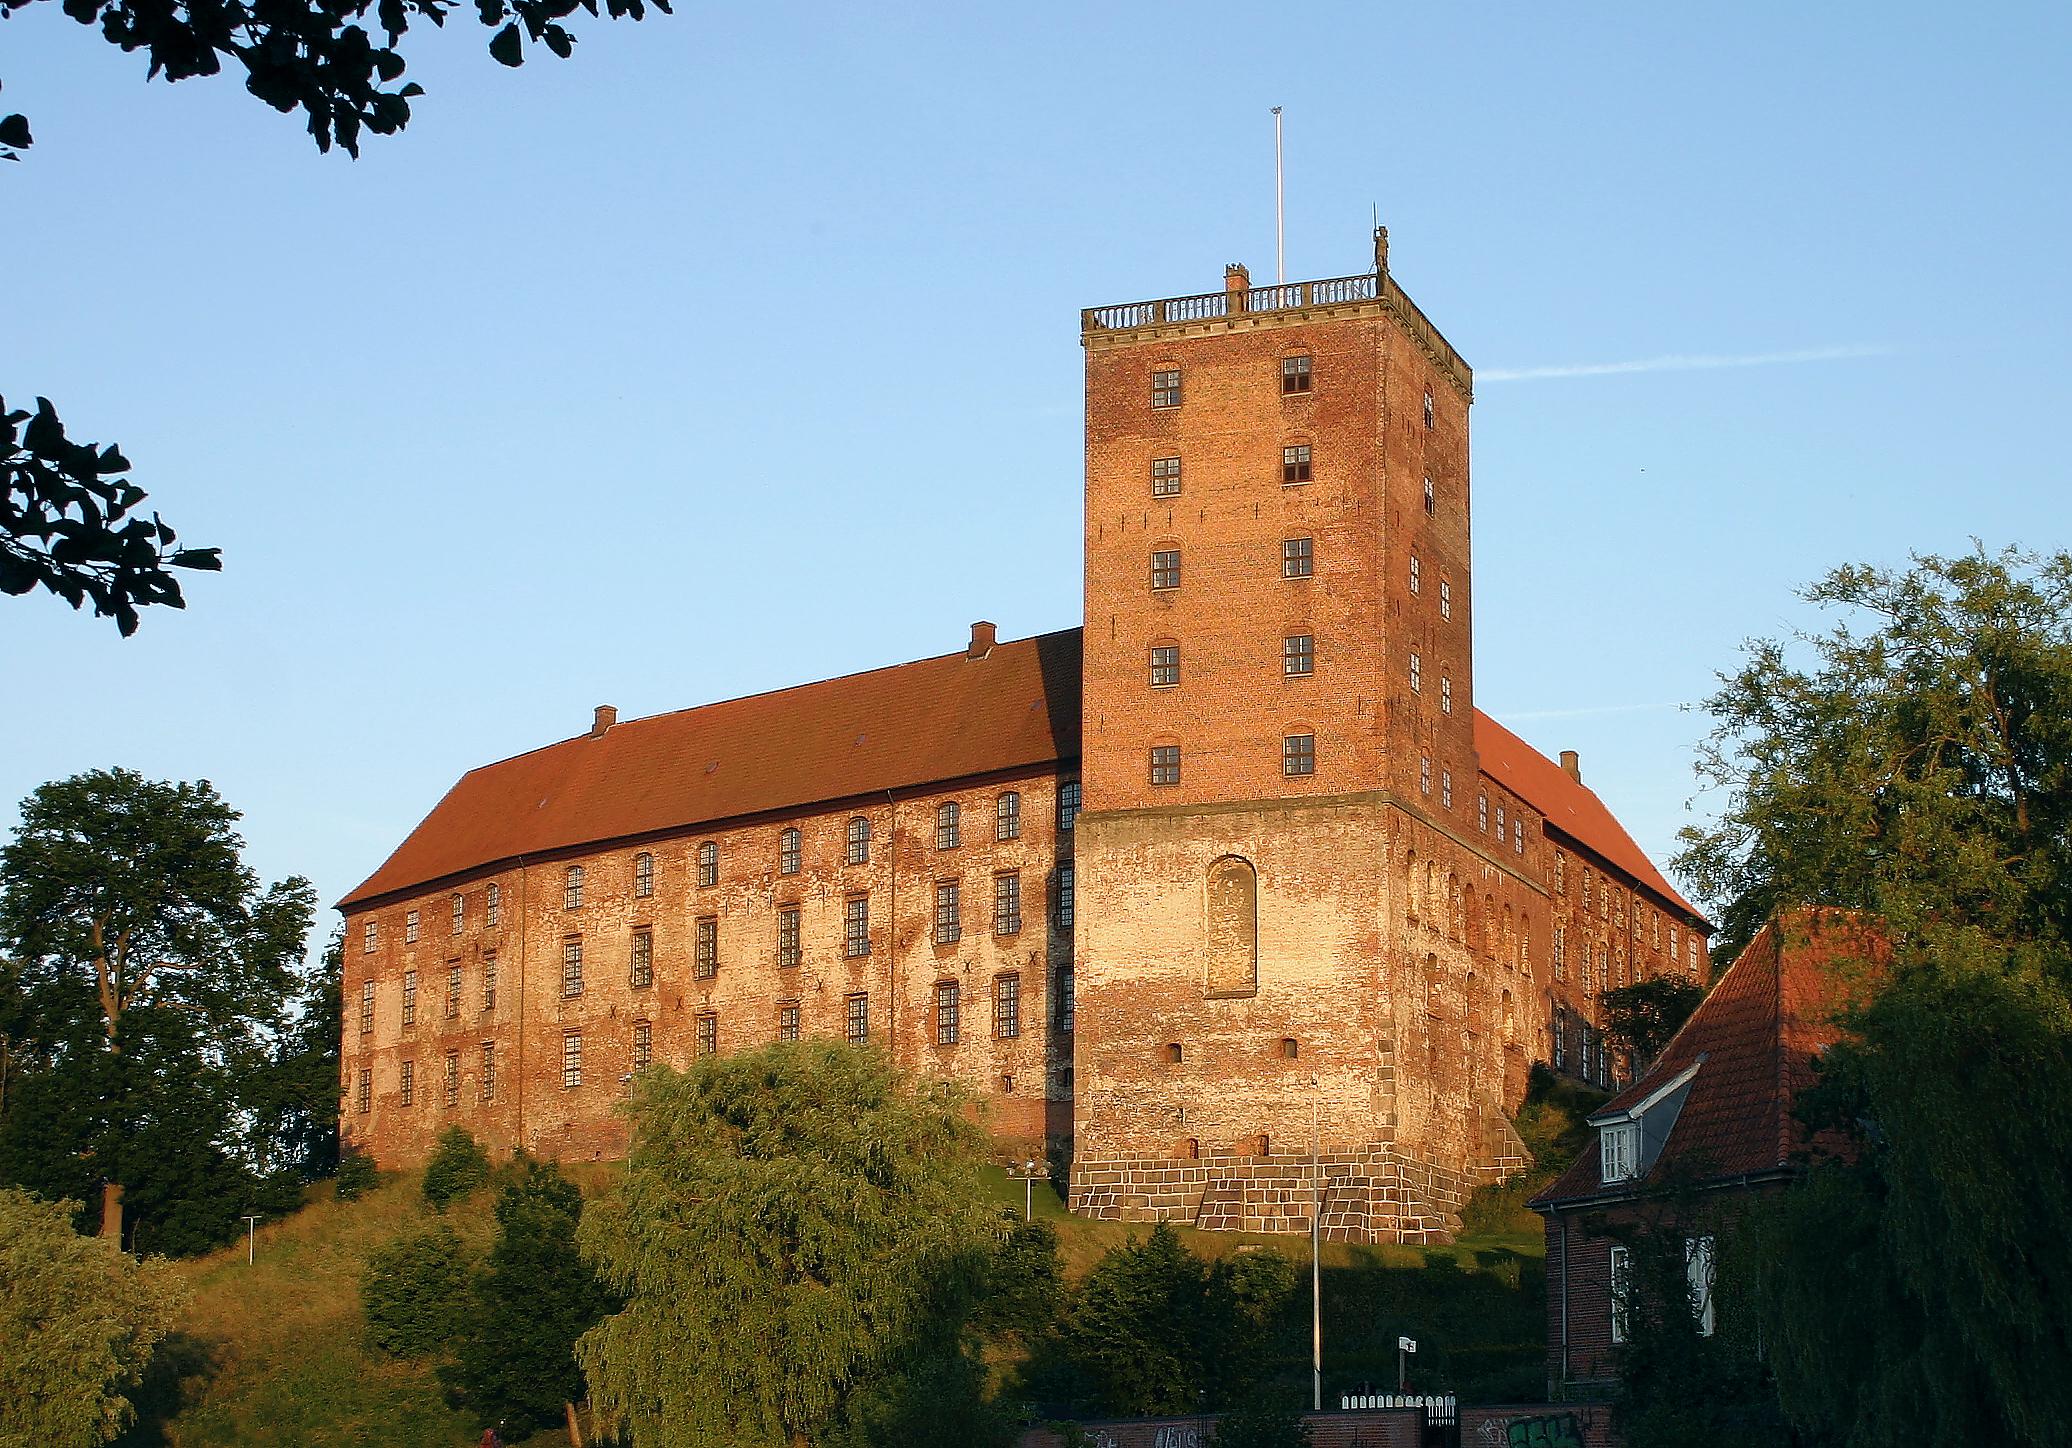 Kolding City Tour Guide(Denmark)